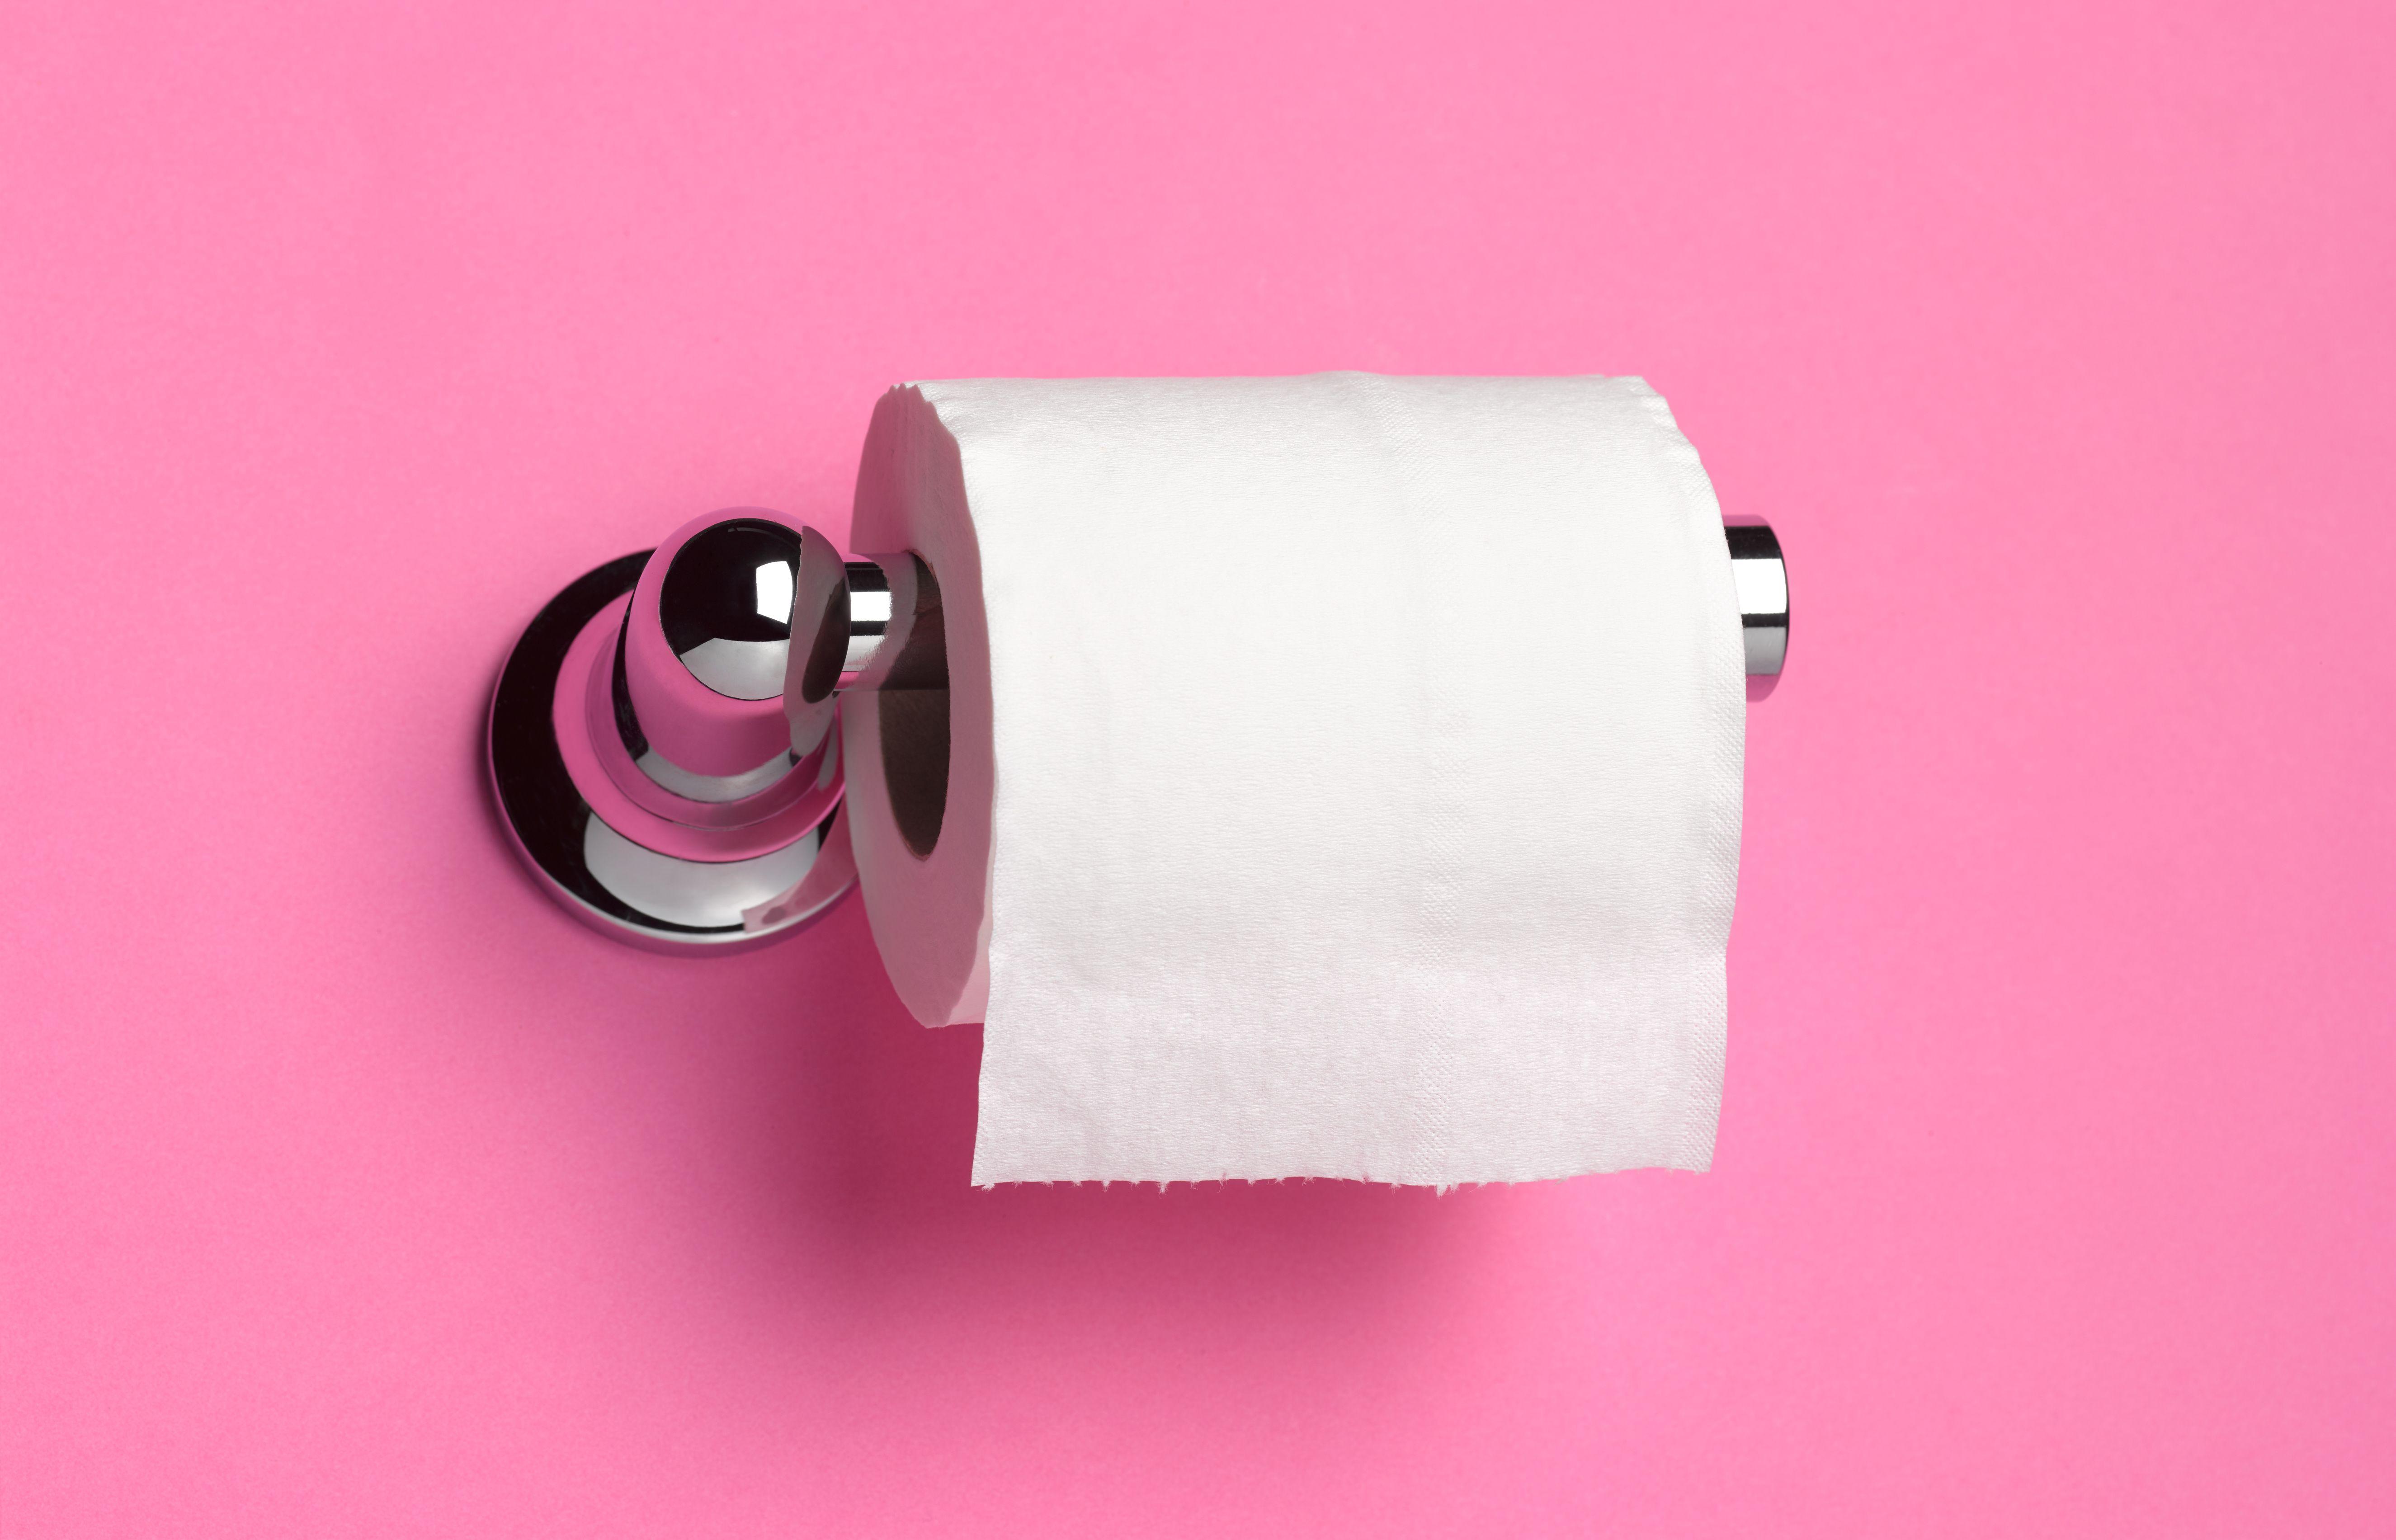 Is Diarrhea an Early Symptom of Novel Coronavirus? Doctors Explain